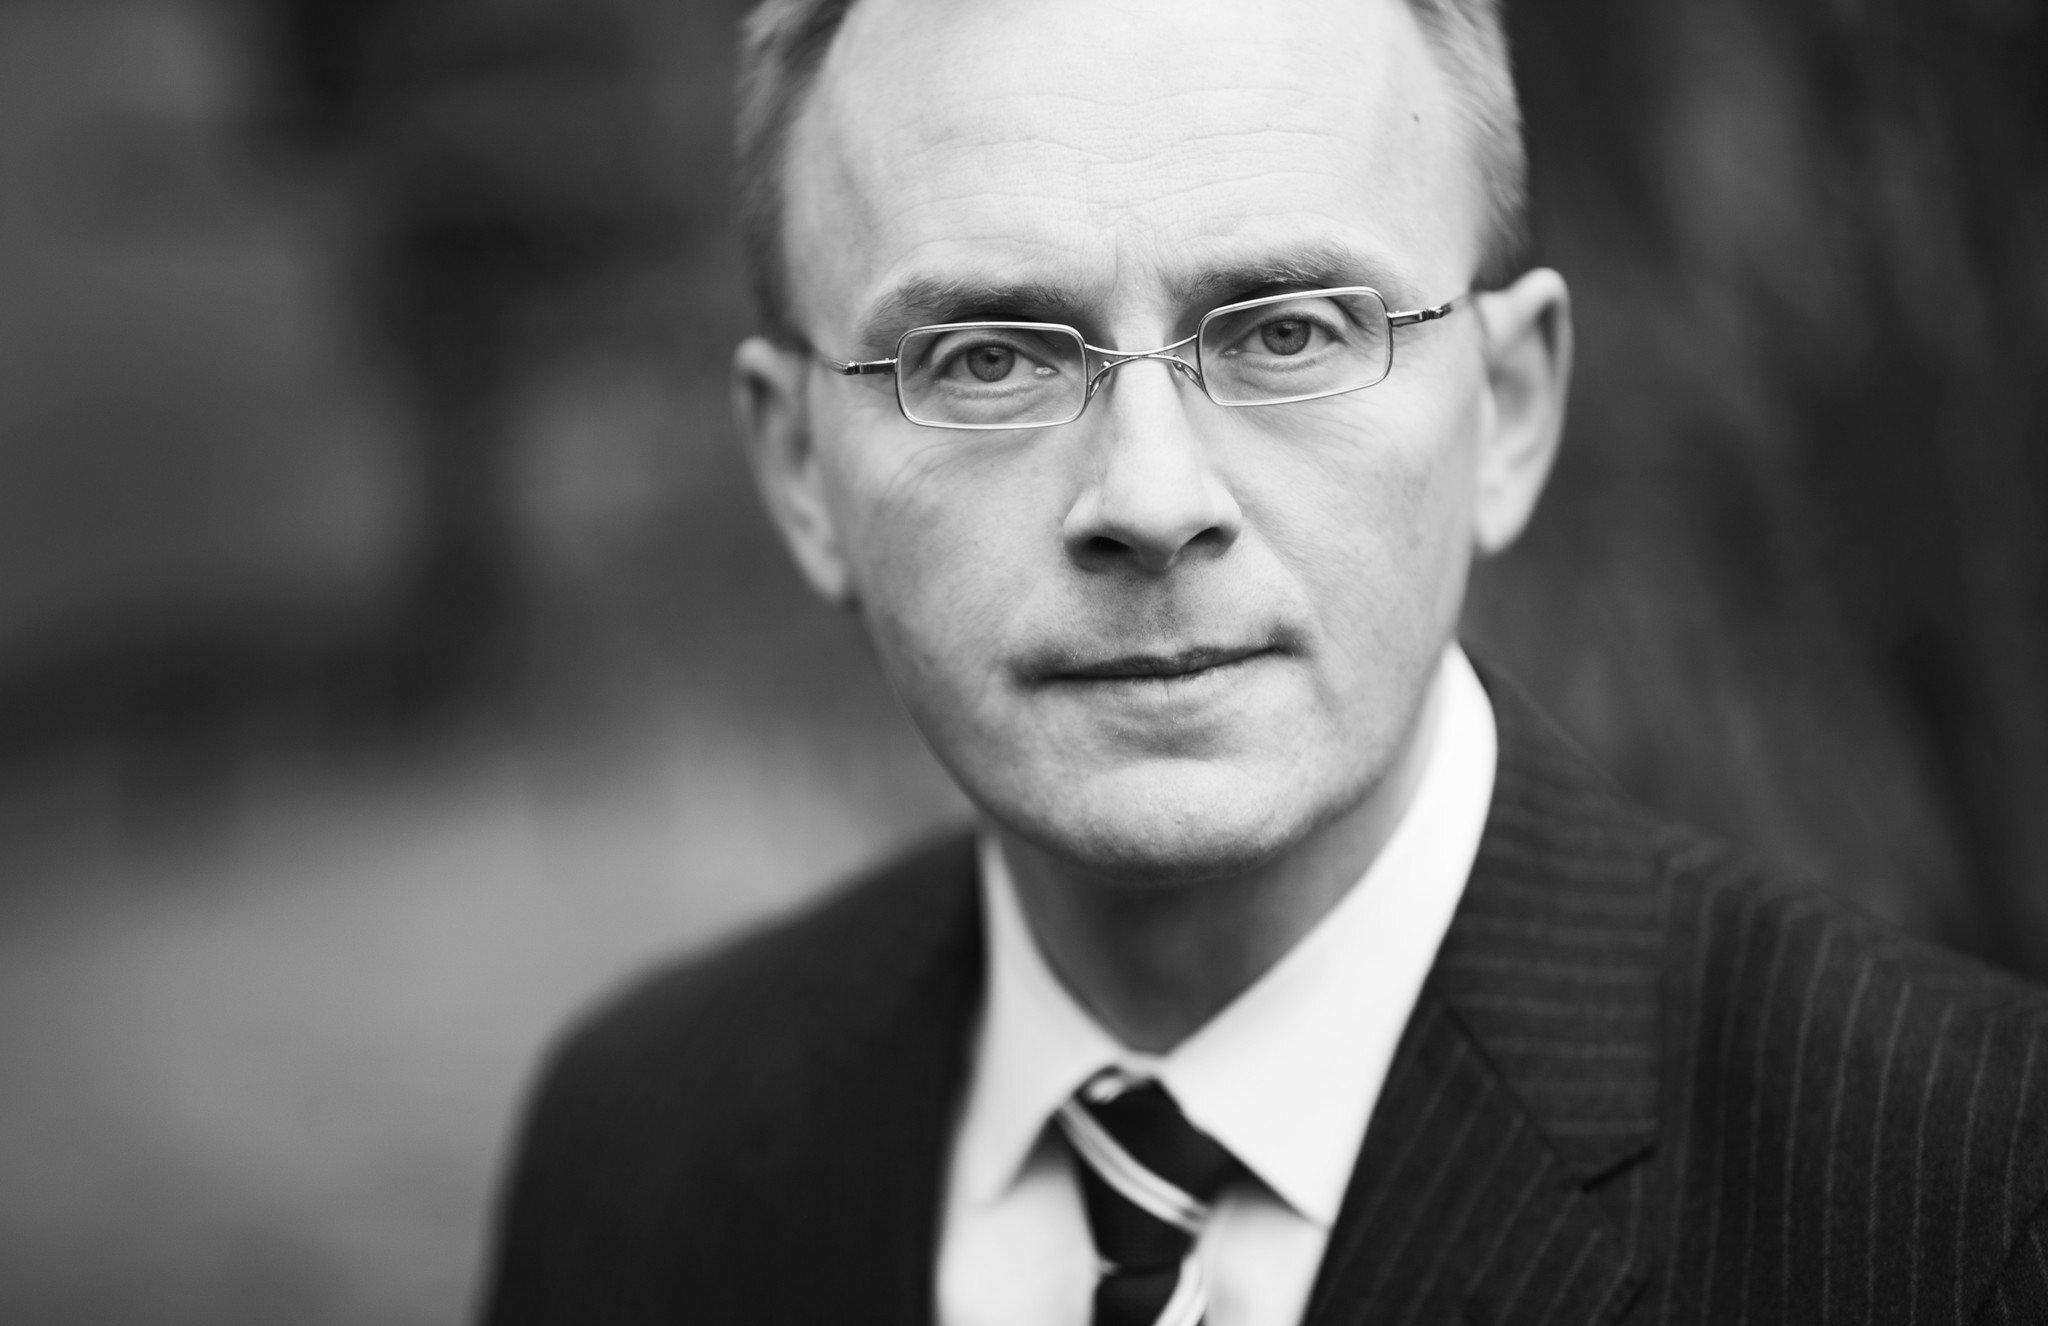 Soberg_Morten_Pernille_Blafjell_Walvik_2017_2.jpg